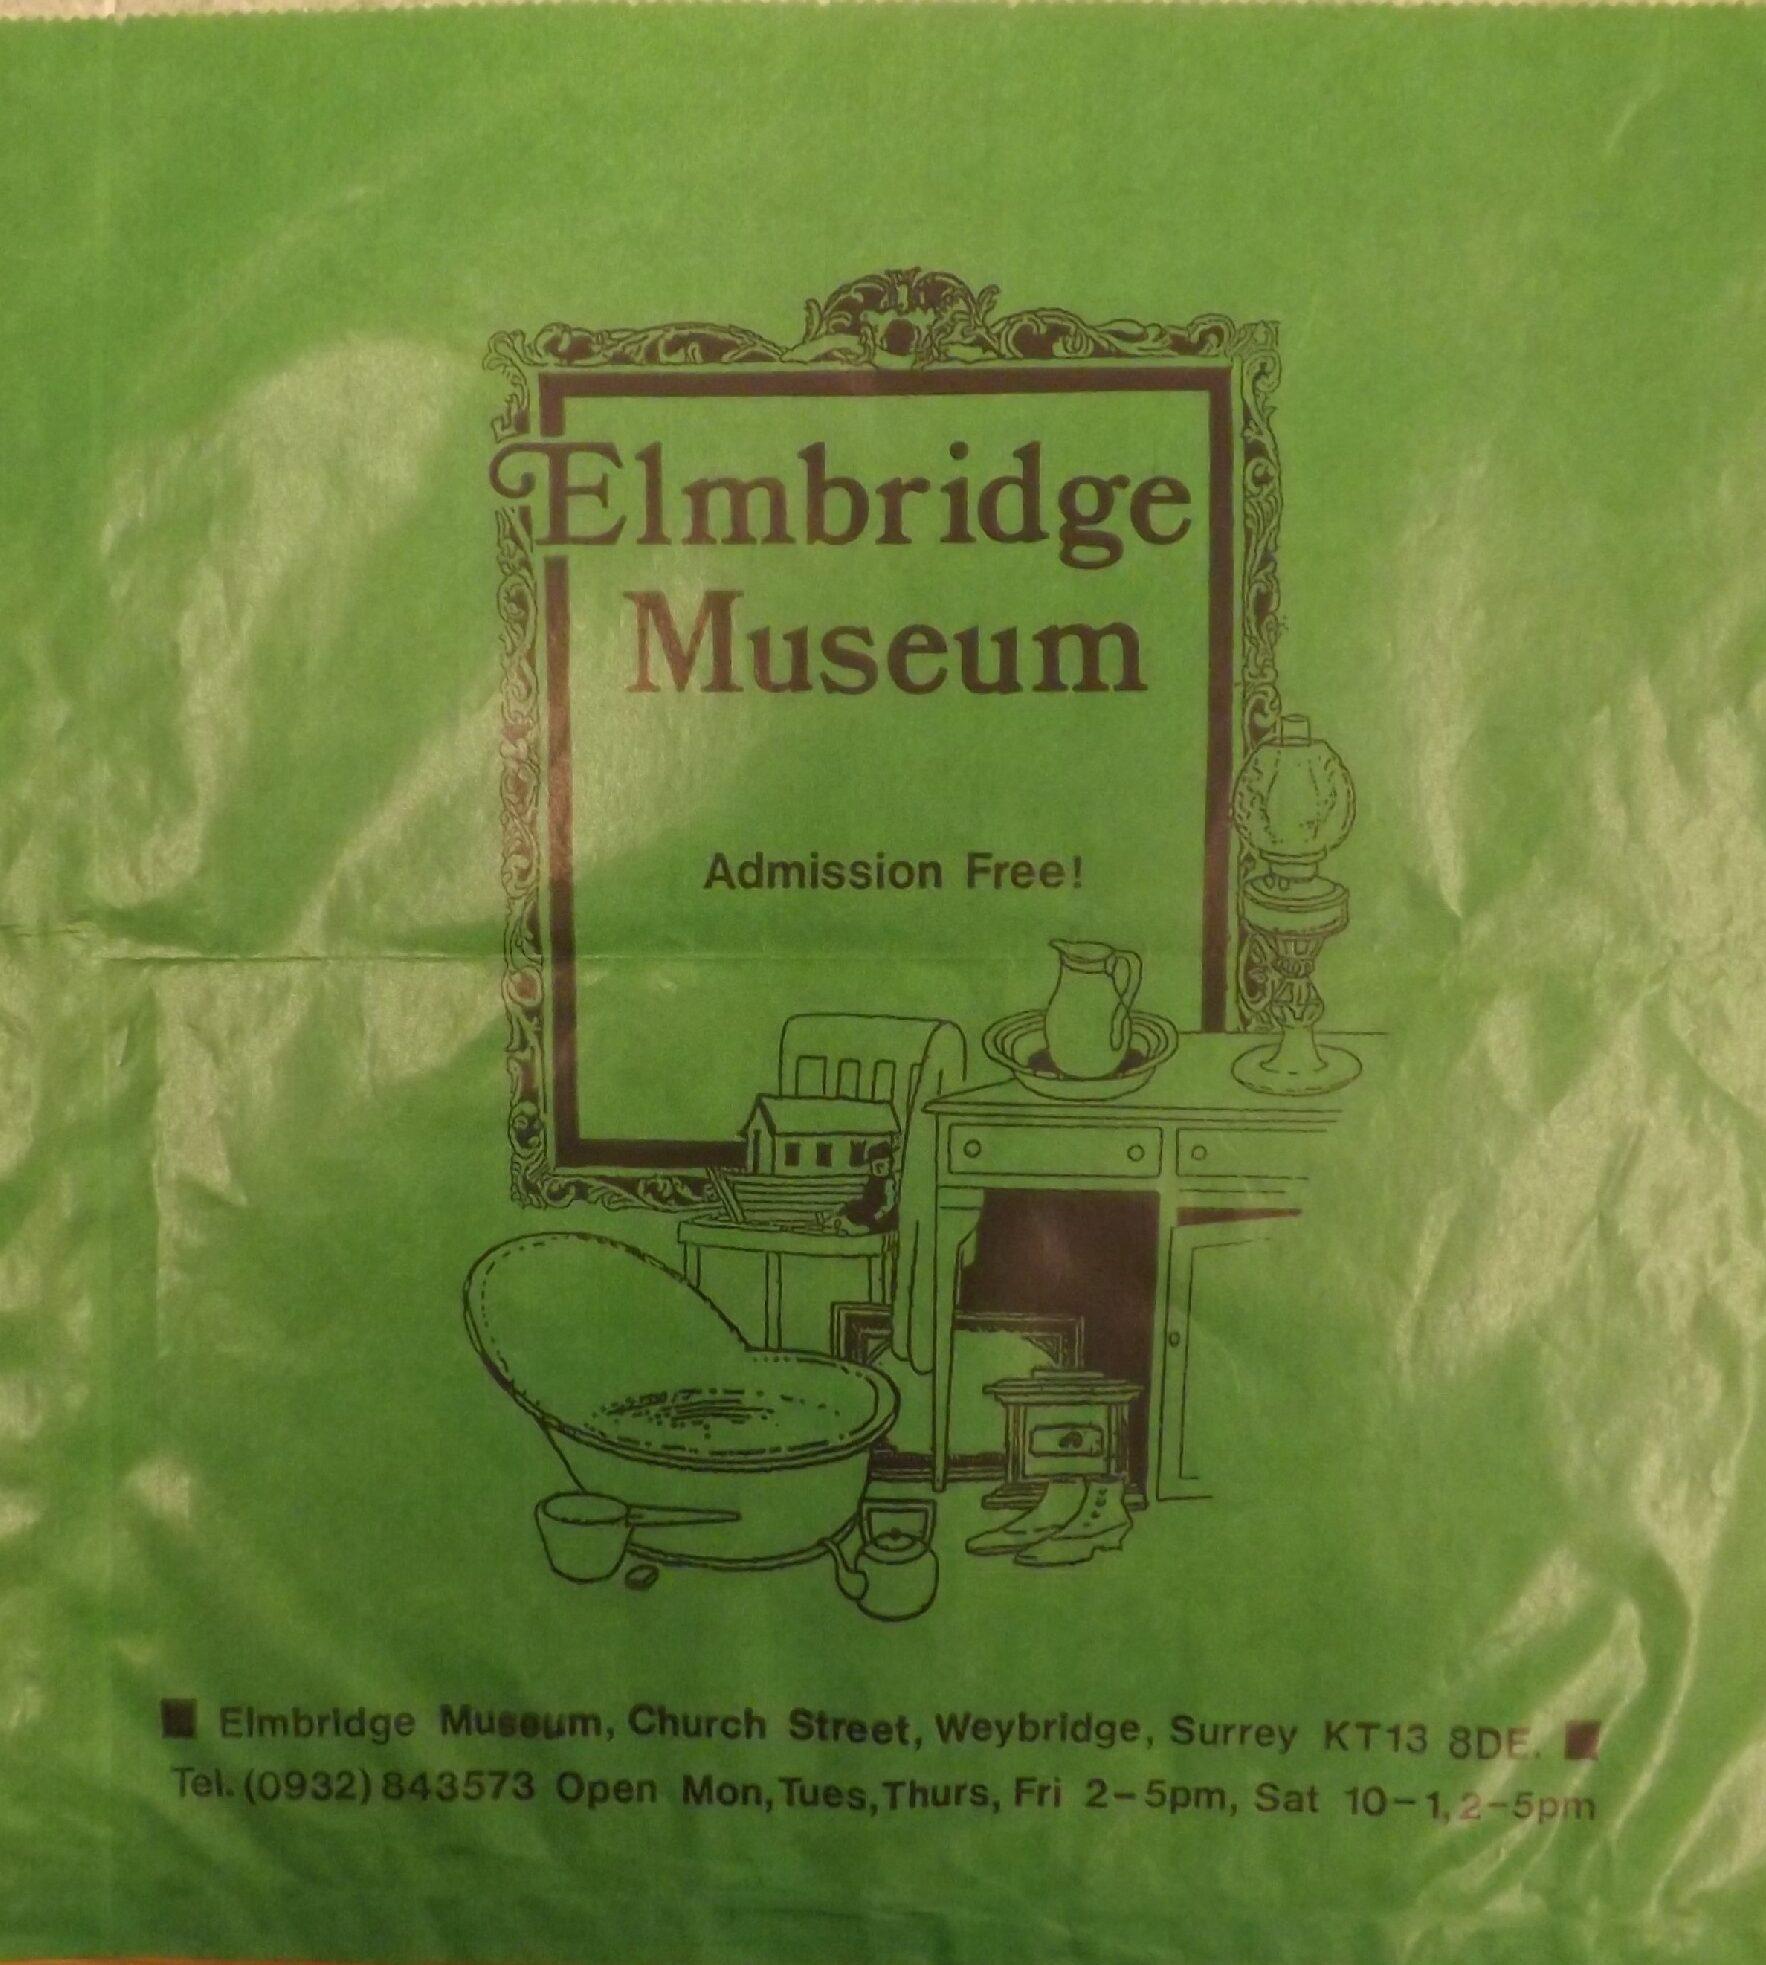 Paper bag from the former Elmbridge Museum shop, c.1990s.